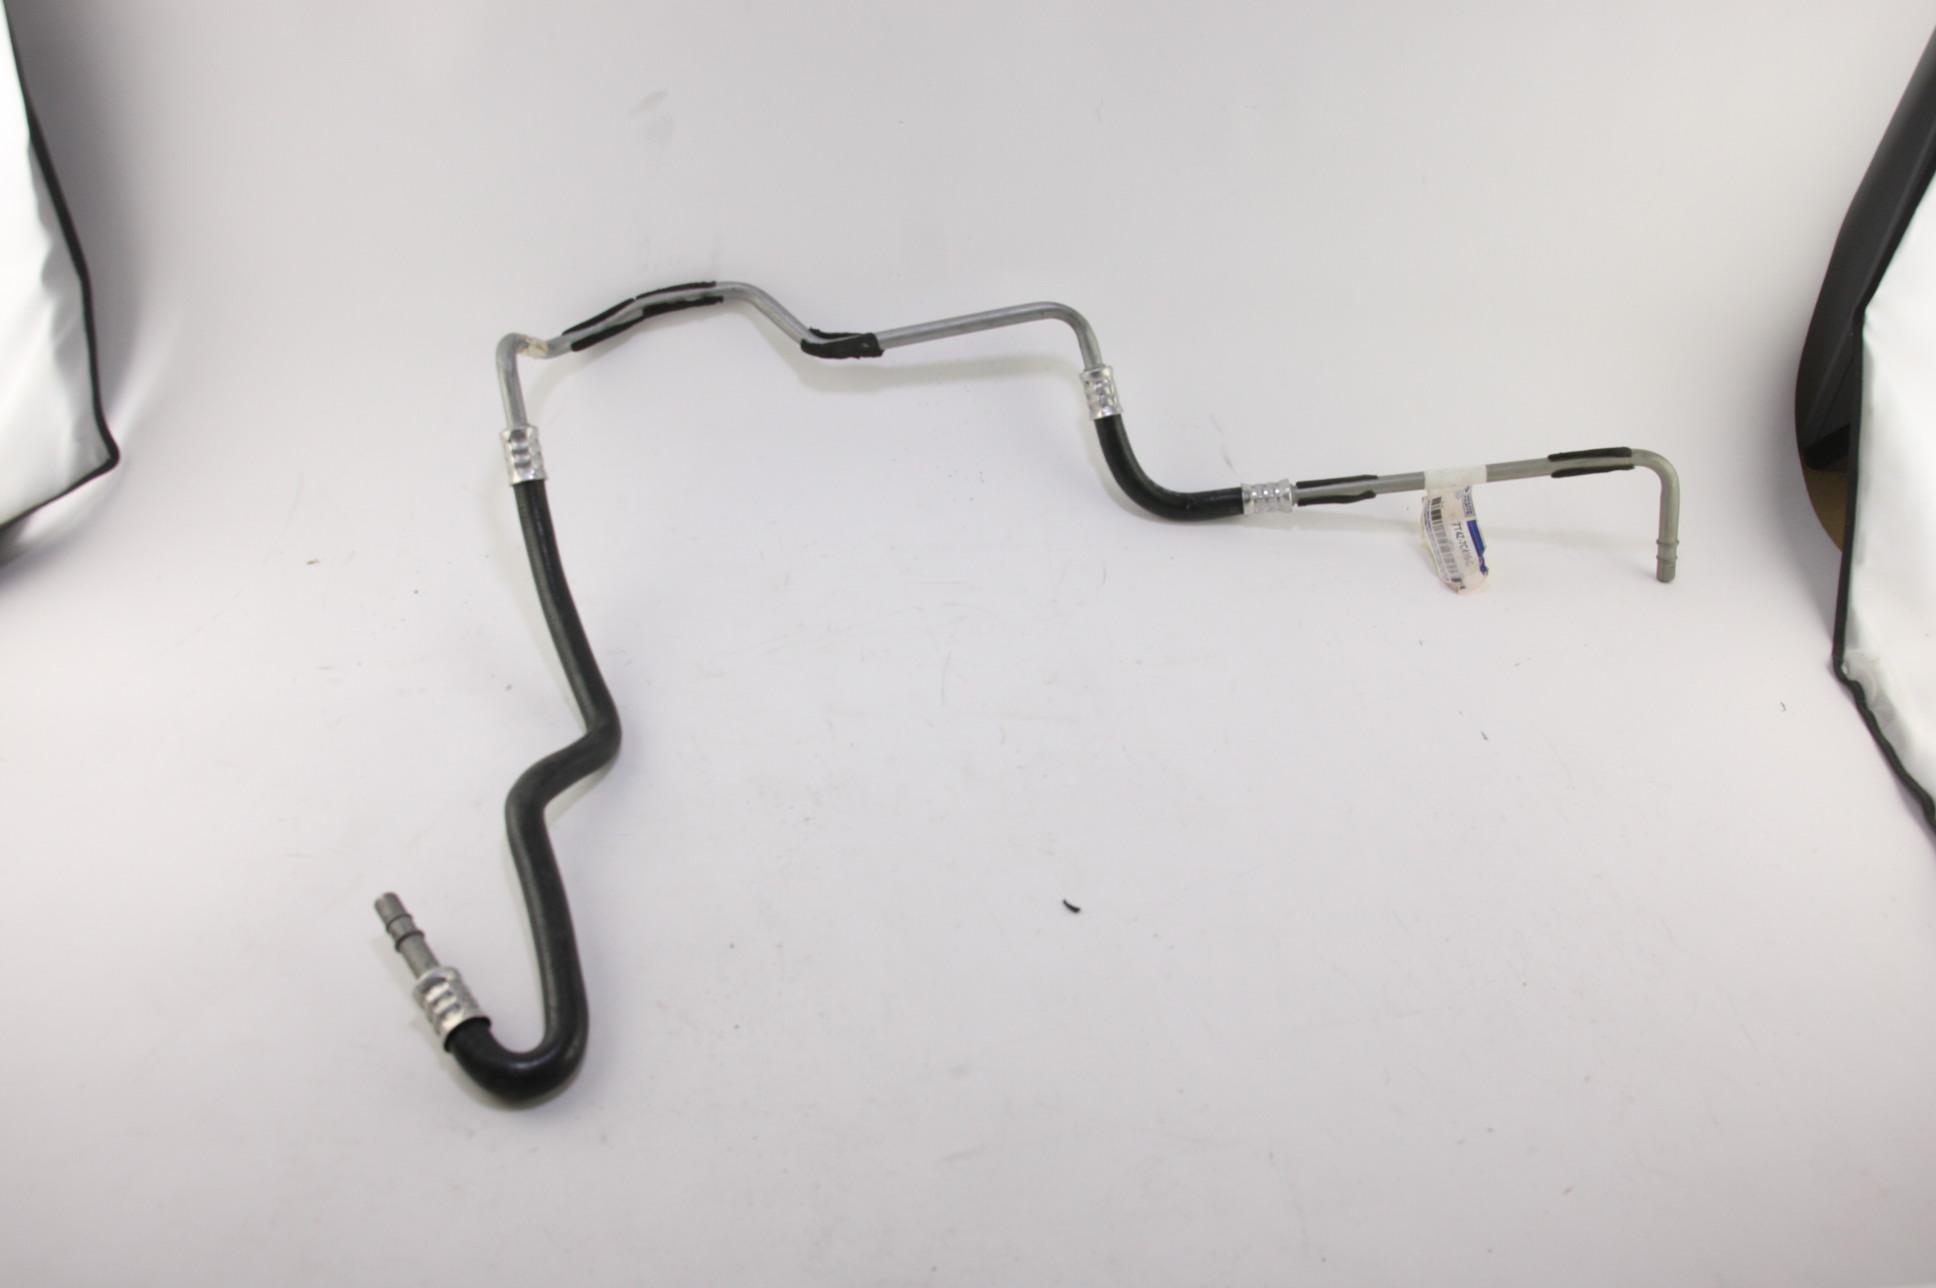 New OEM 7T4Z7C410C Ford Transmission Oil Cooler Upper hose Free Shipping NIP - image 1